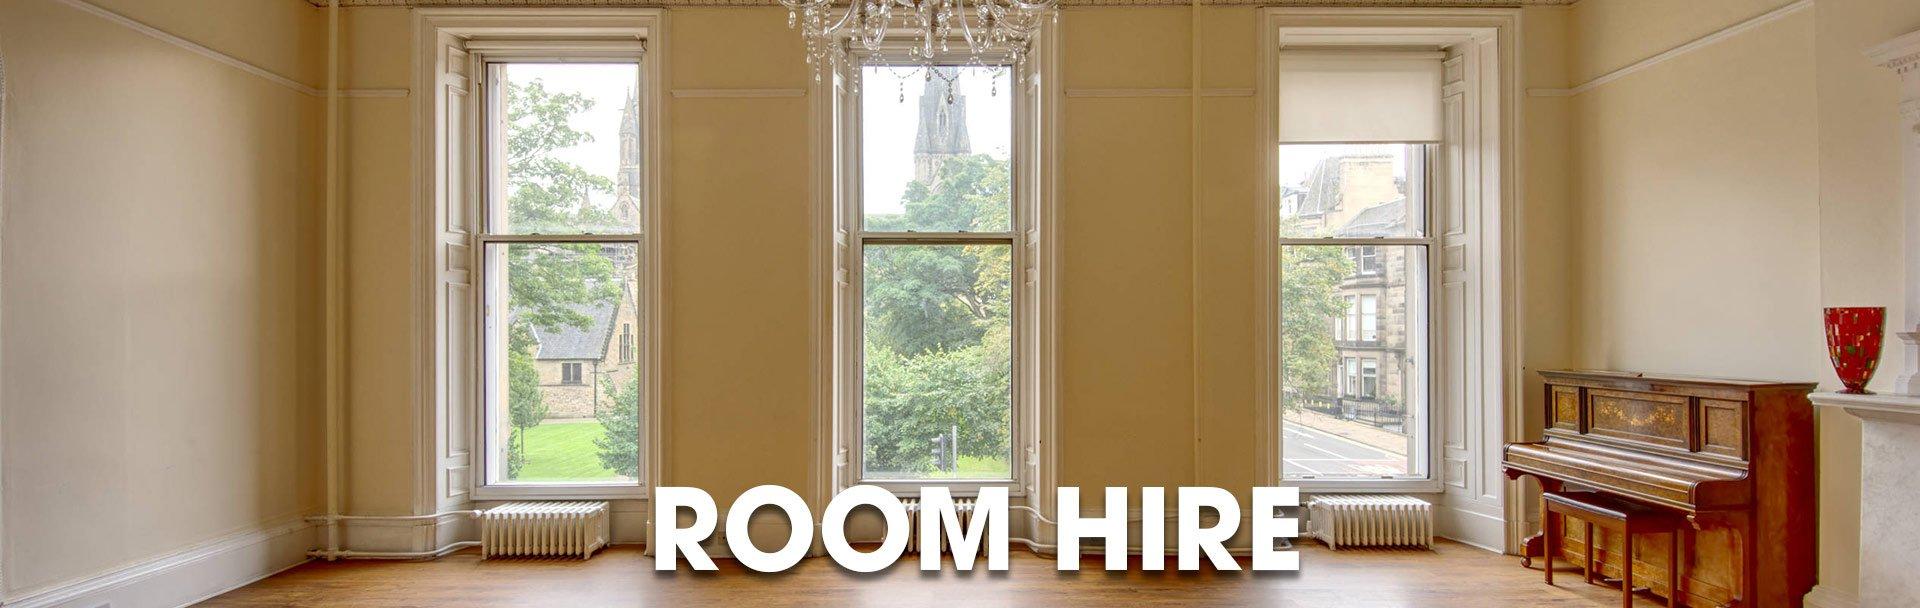 Affordable Room Hire in Edinburgh at the Sir Arthur Conan Doyle Centre